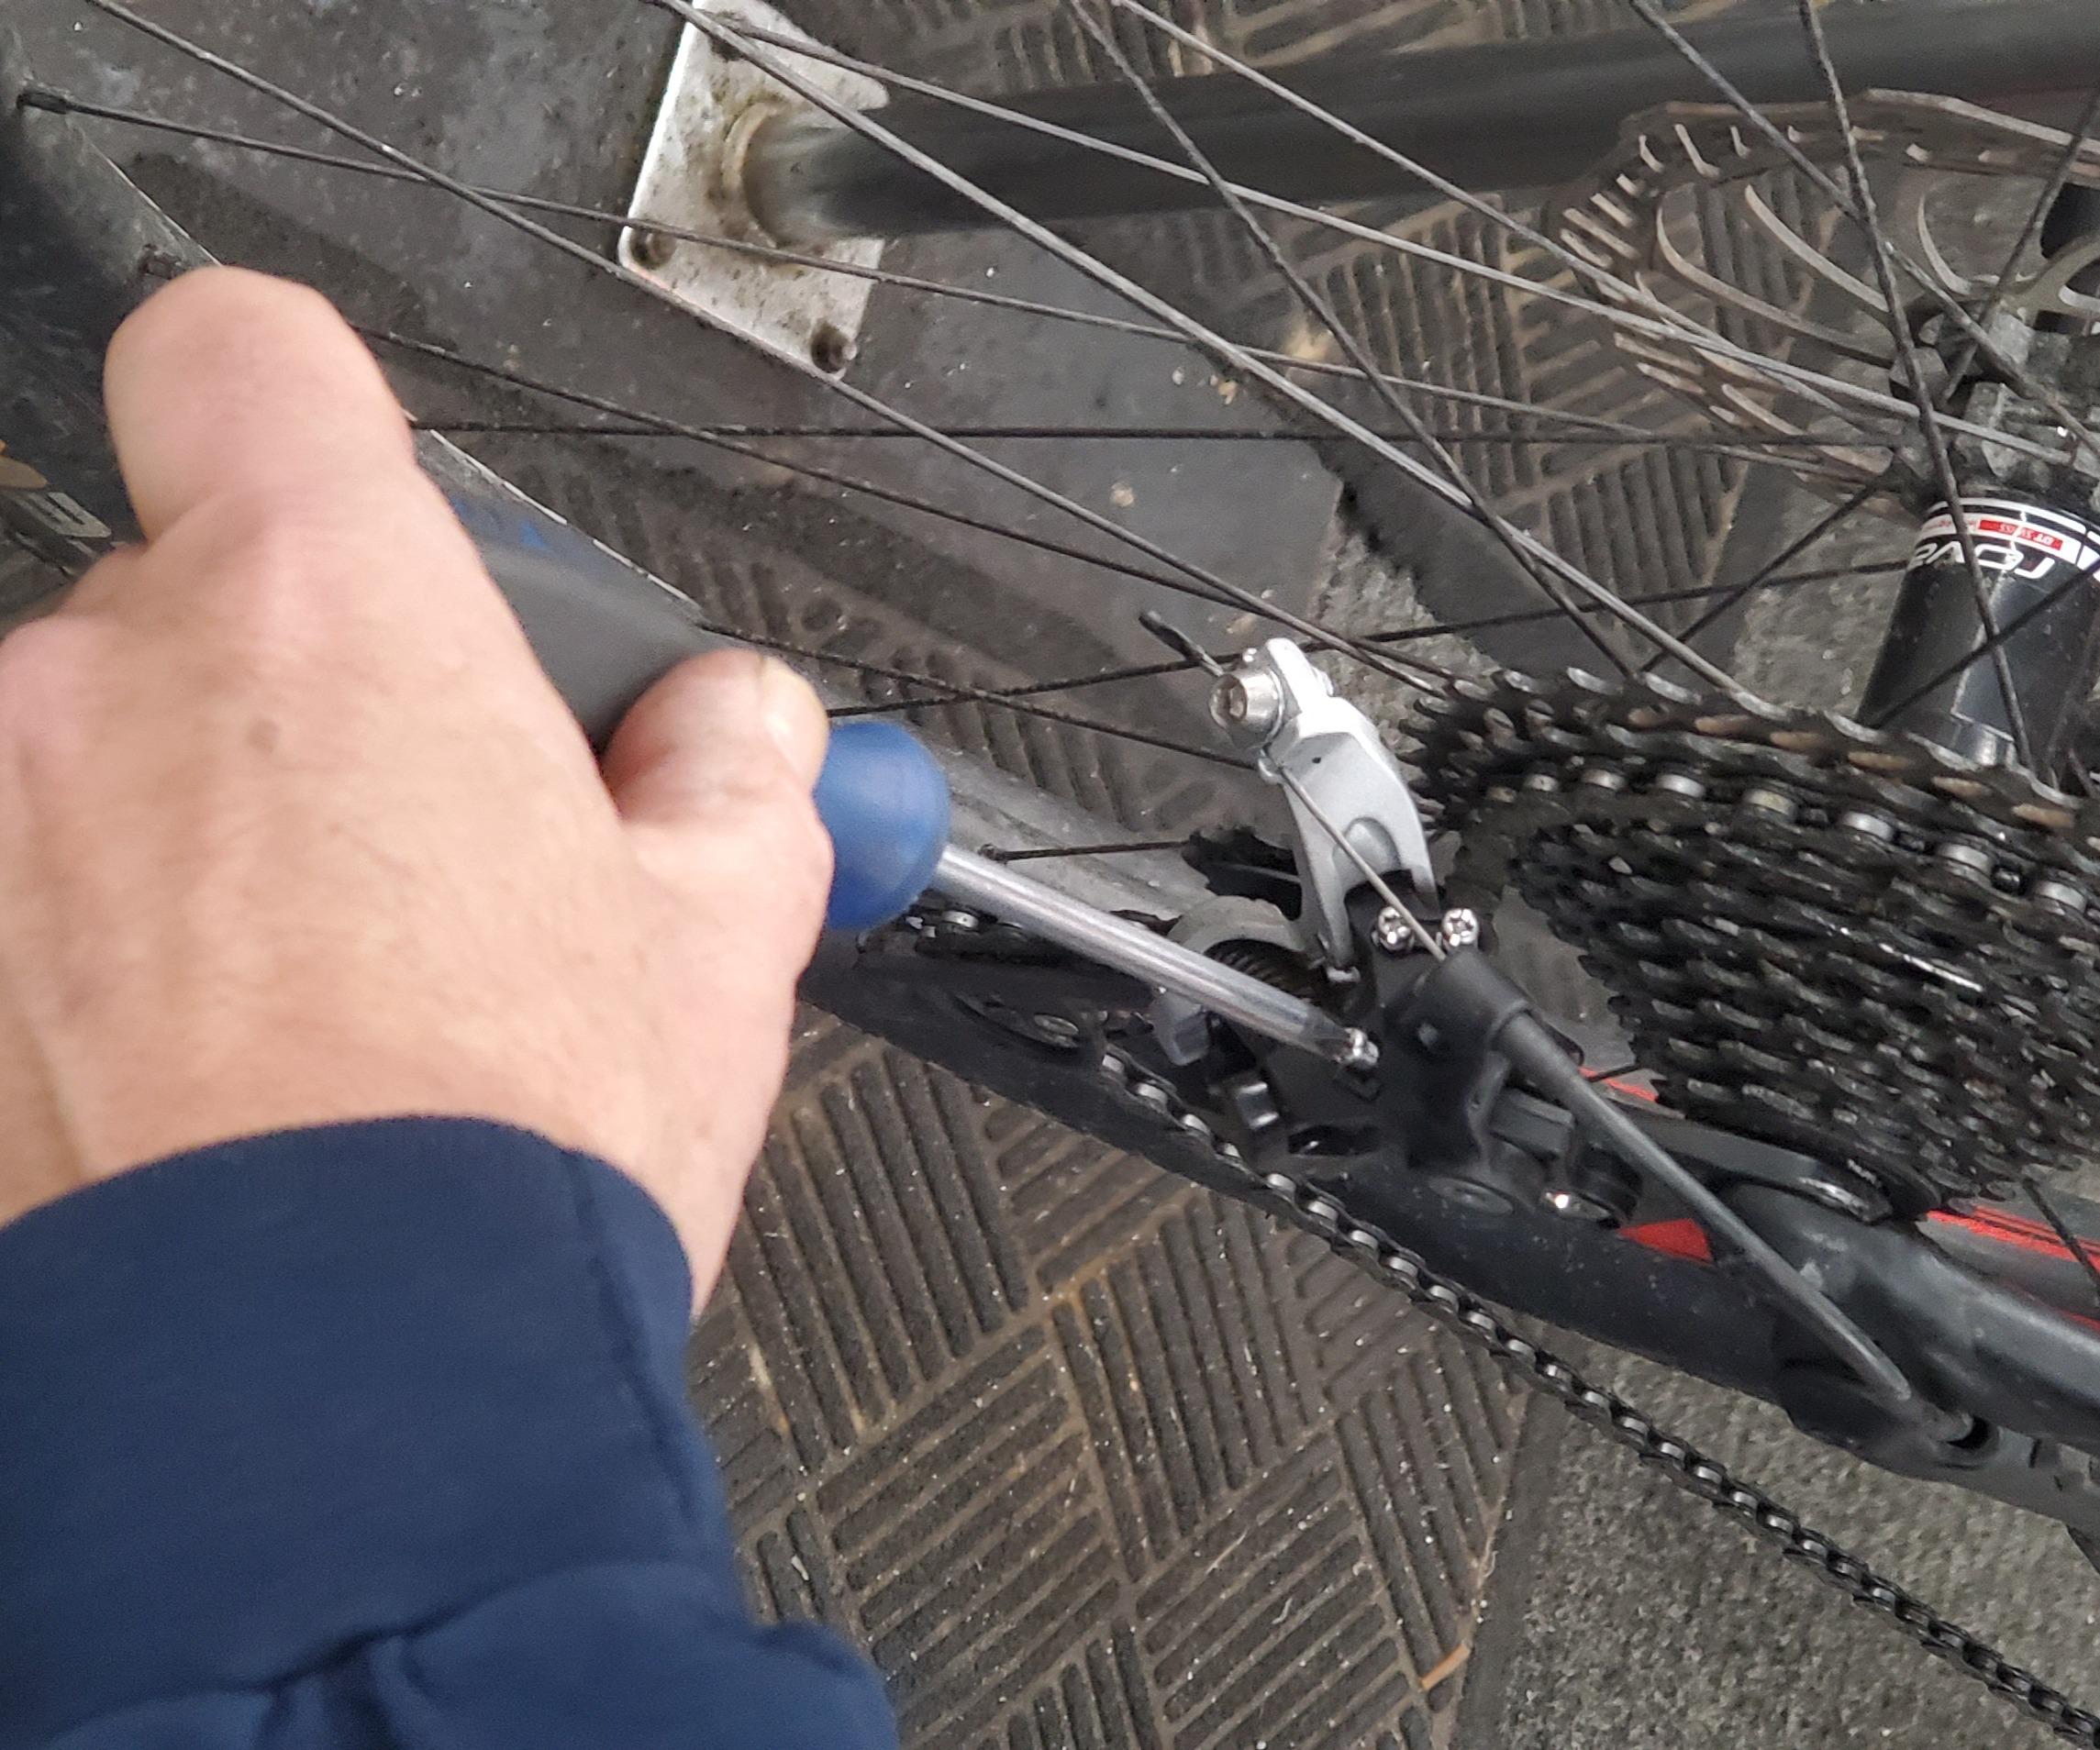 Bike Mechanic making adjustments